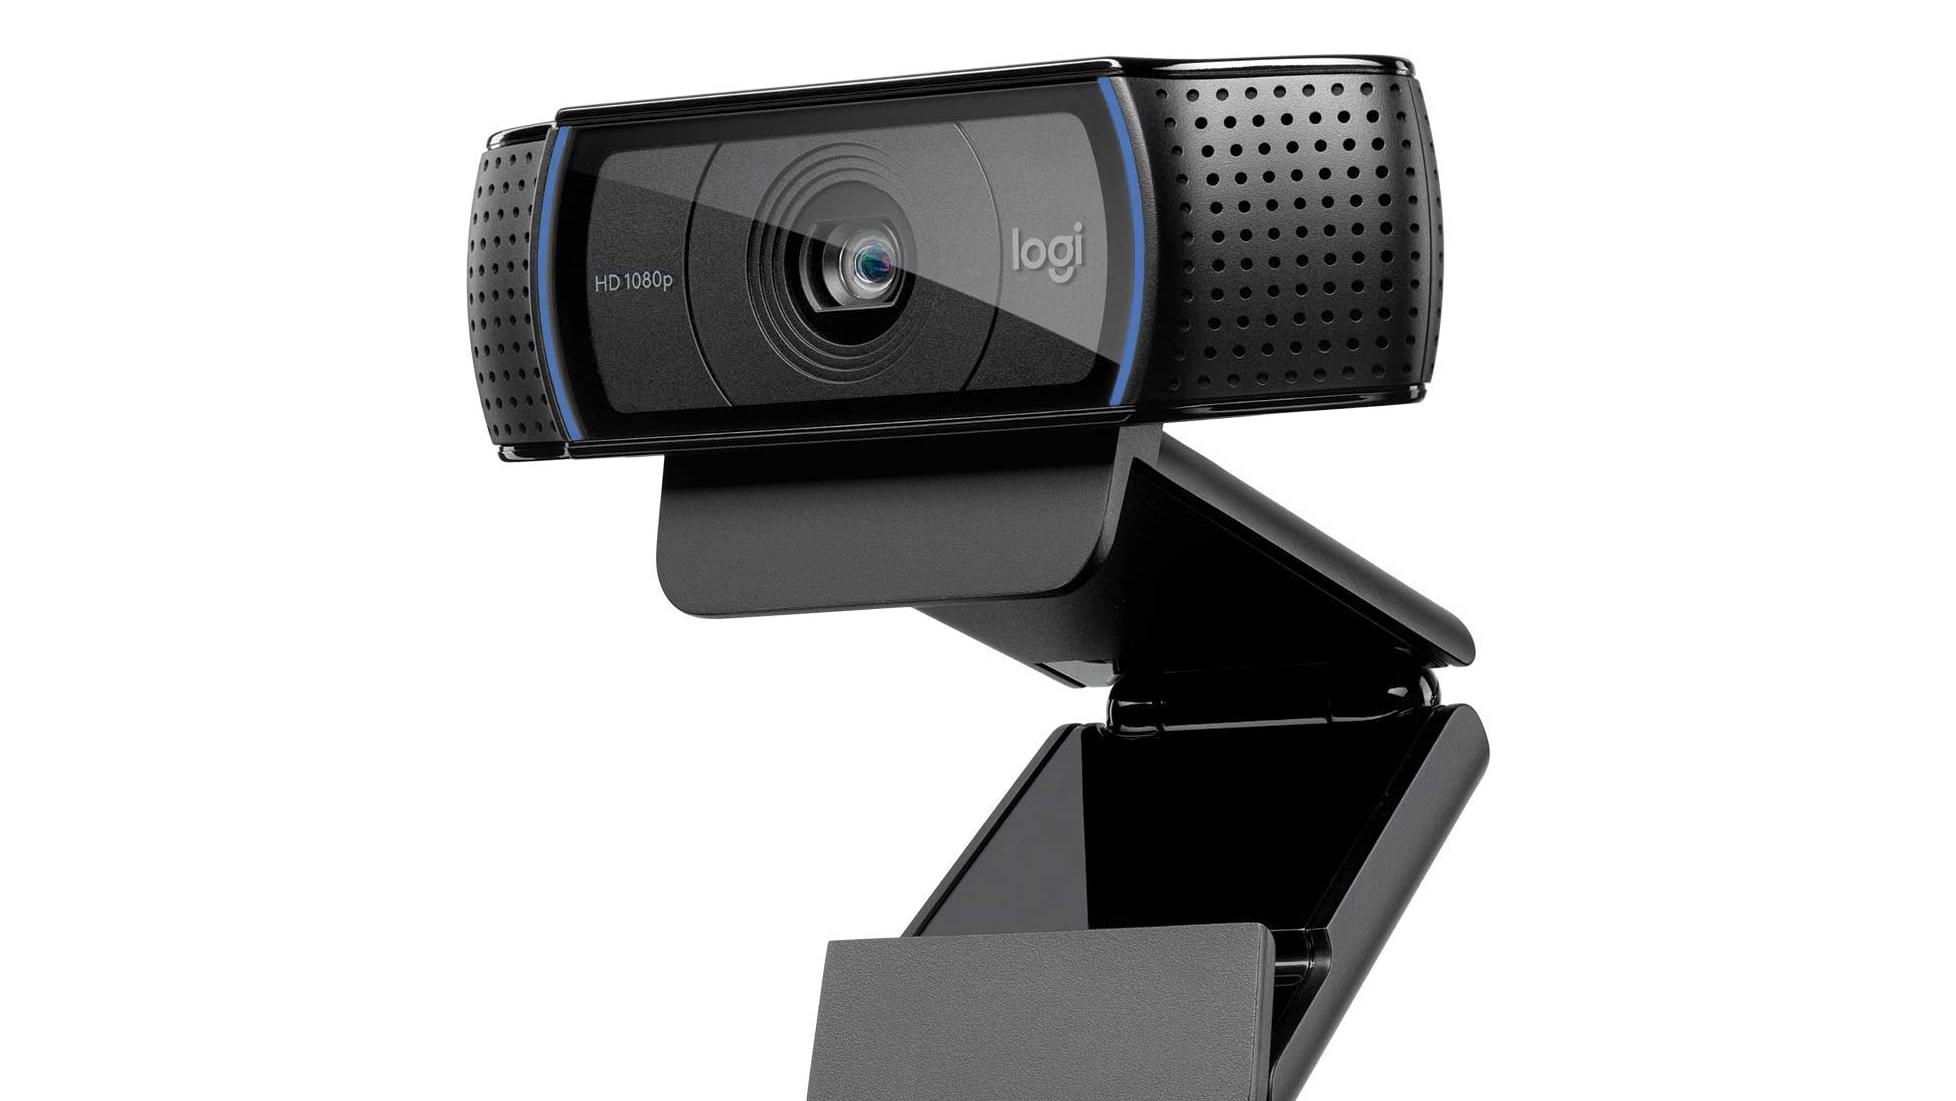 amazon webcams